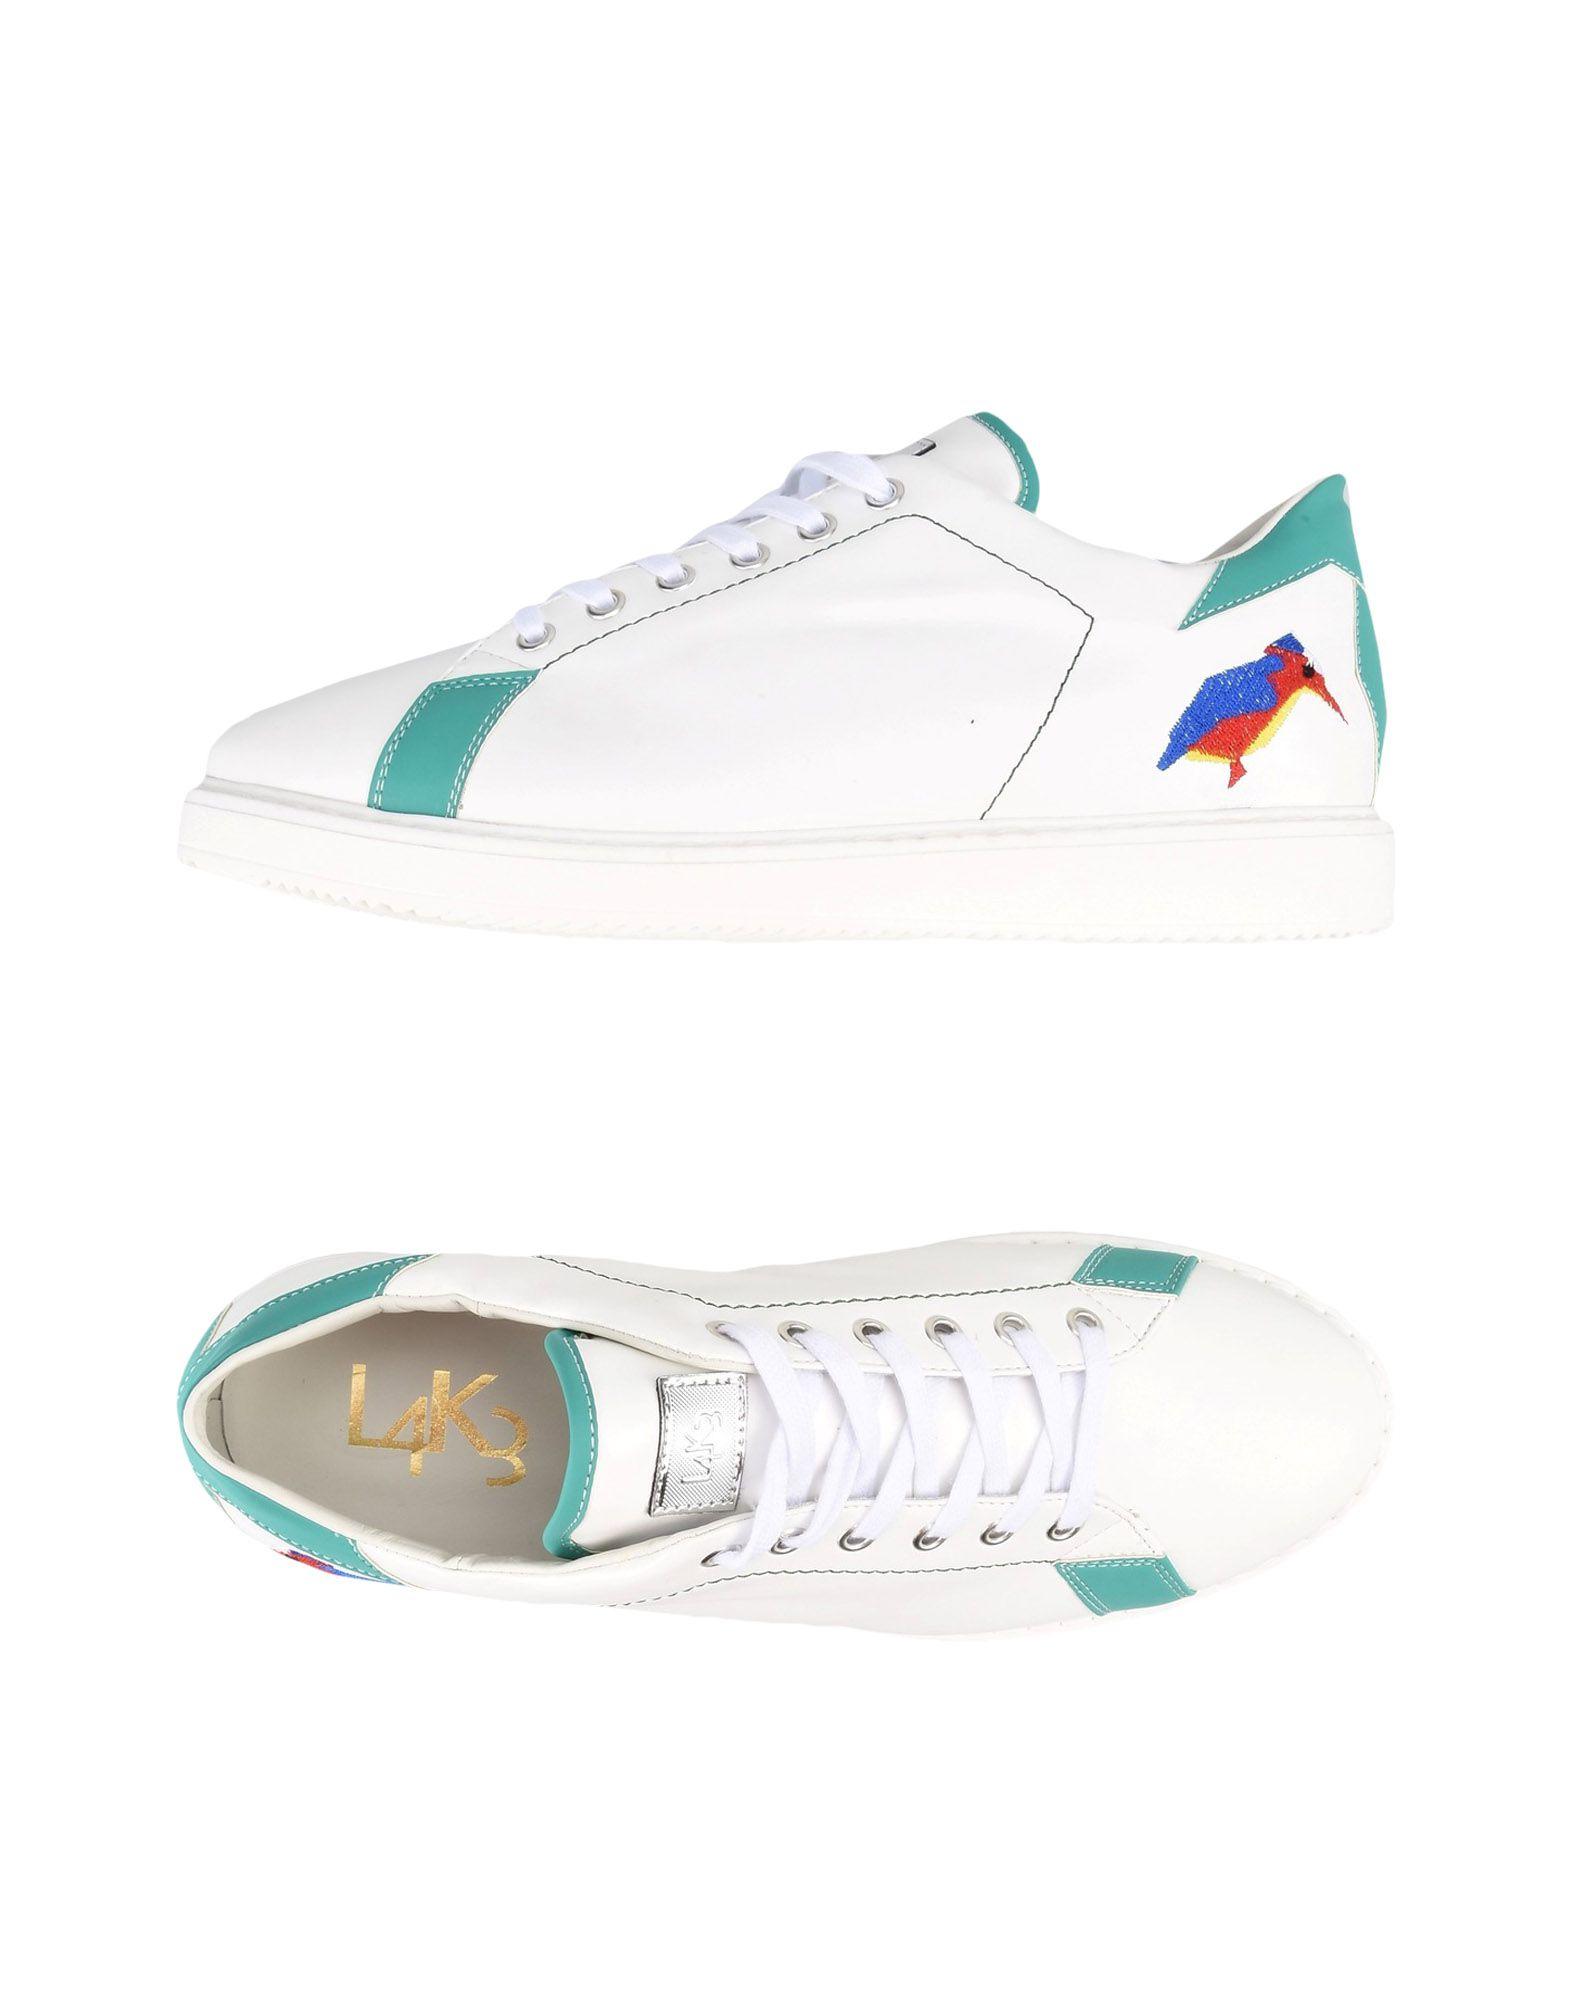 Sneakers L4k3 Bowling One - Homme - Sneakers L4k3 sur